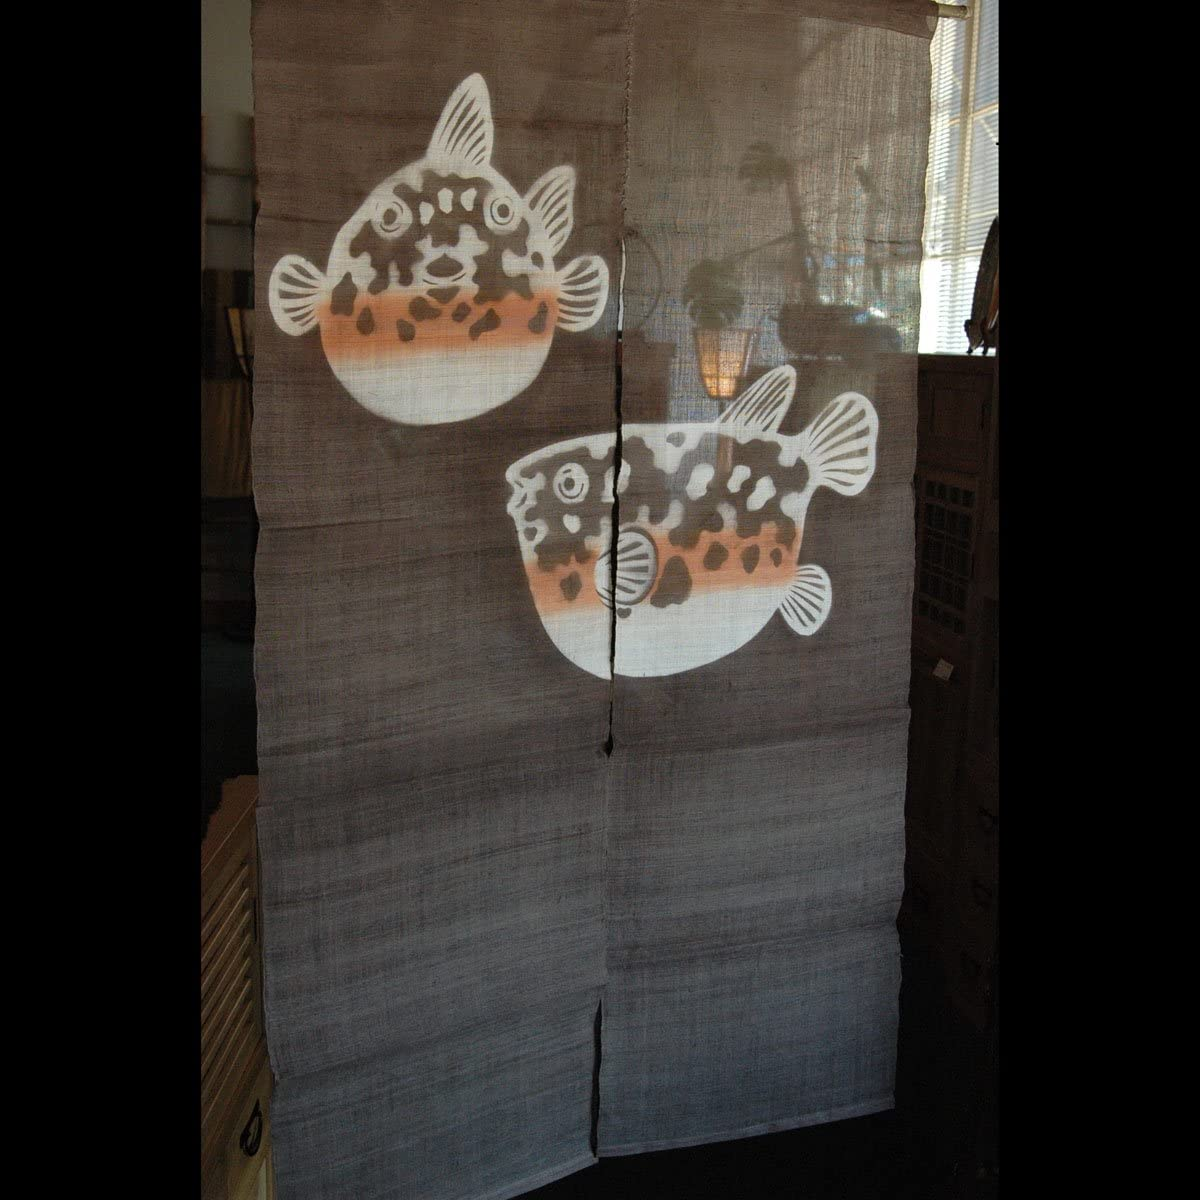 EASTERN CLASSICS Japanese Noren, 07DA02B Linen Door Way Curtain, Blowfish on Brown